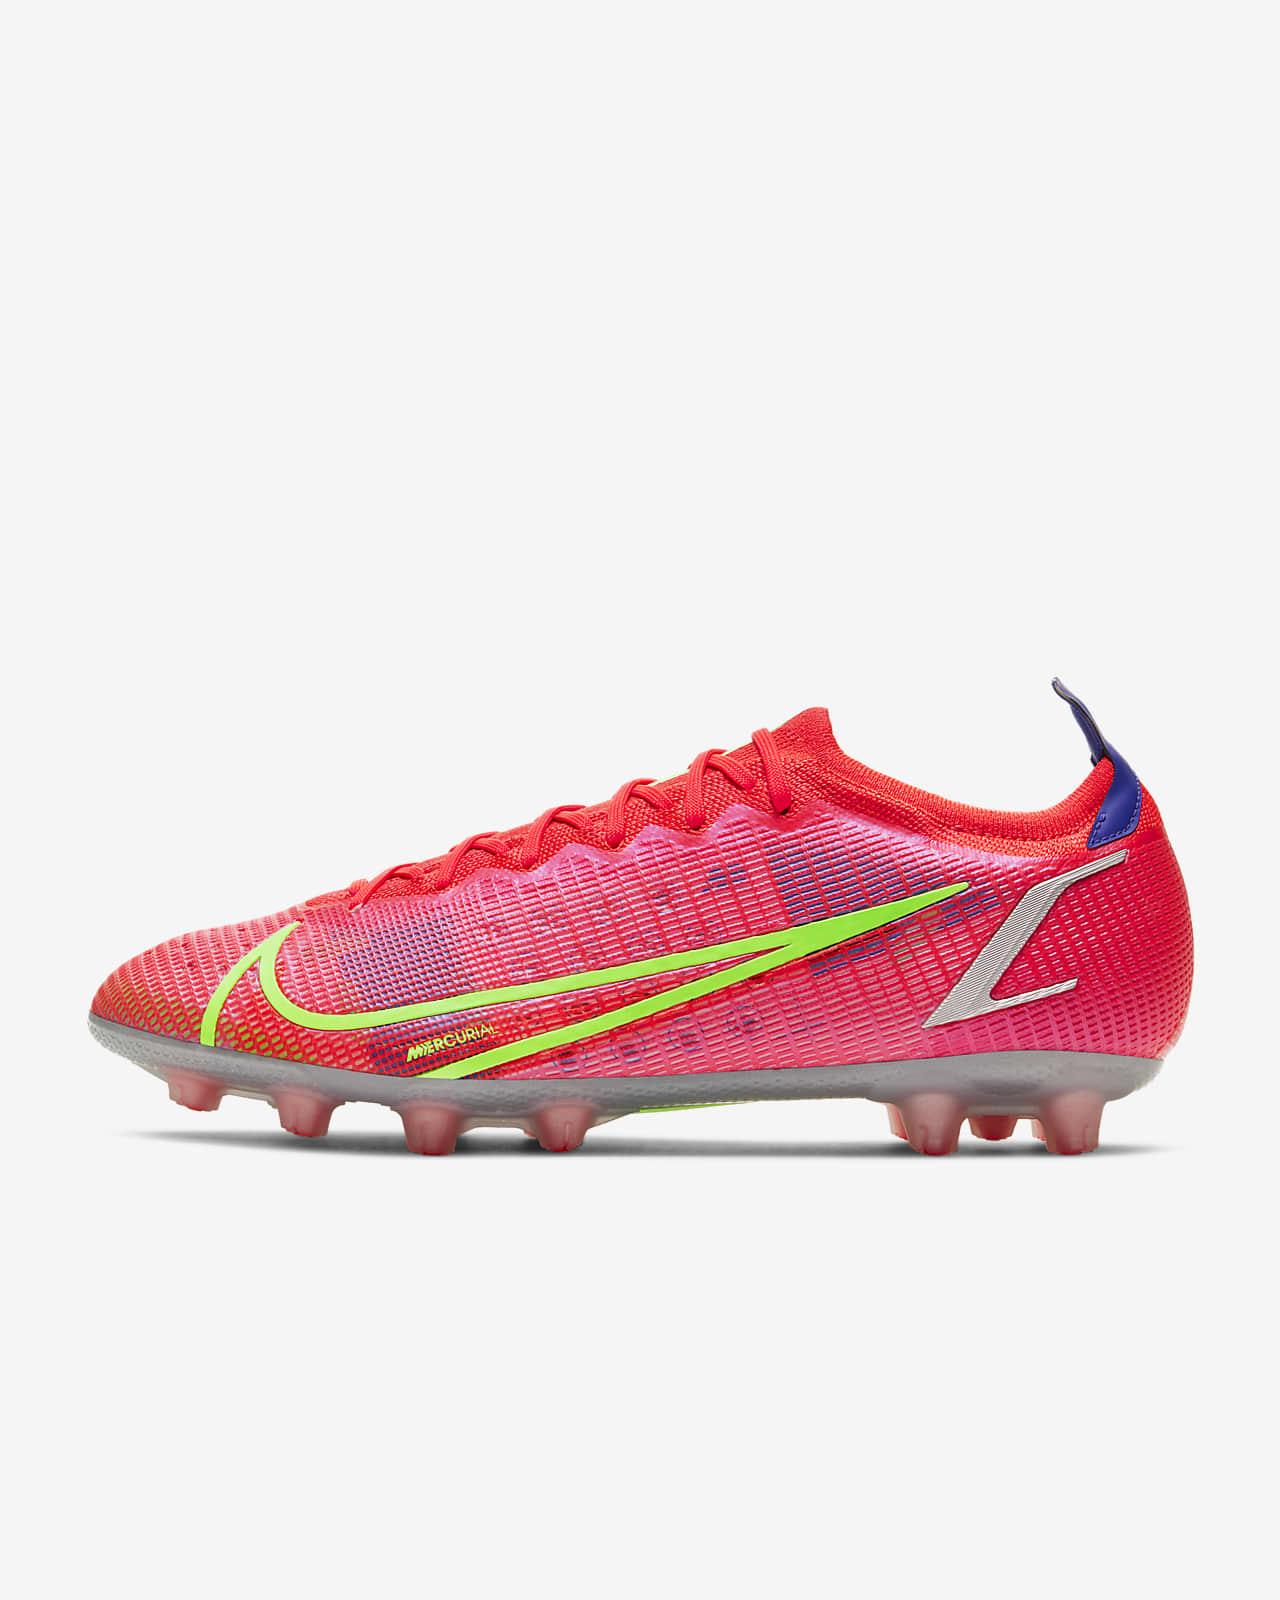 Nike Mercurial Vapor 14 Elite HG Hard-Ground Soccer Cleat